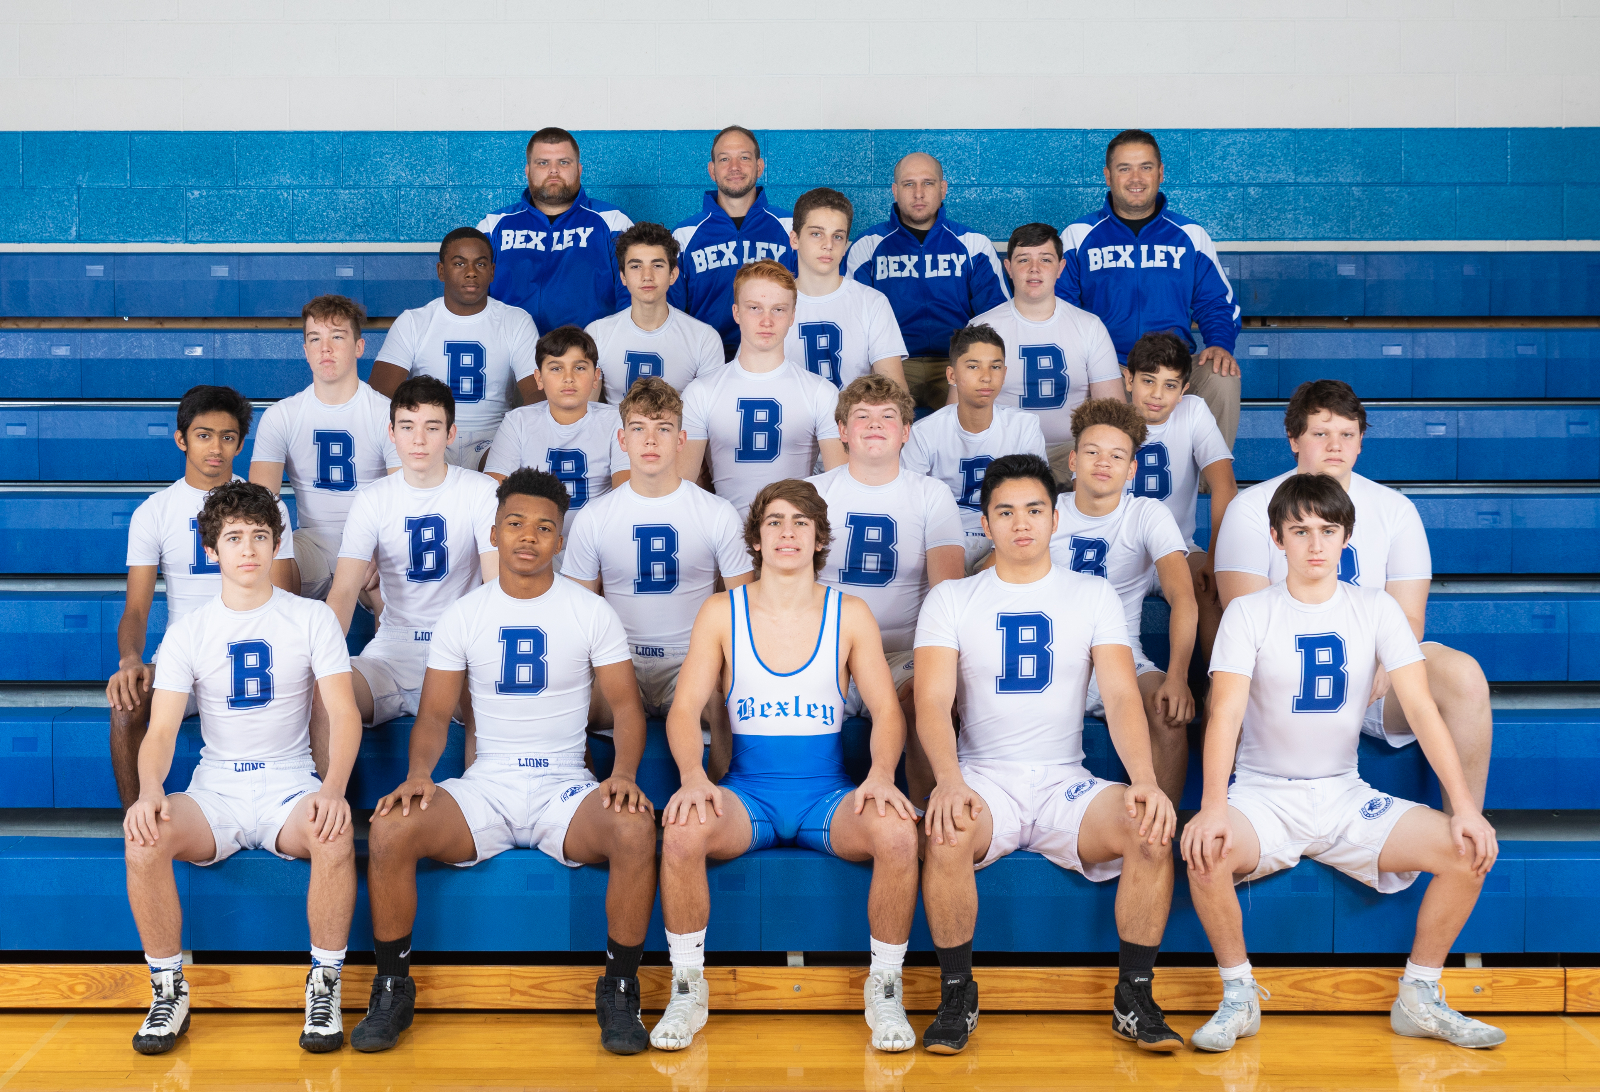 Bexley's young Wrestling team making strides behind Brenner's leadership